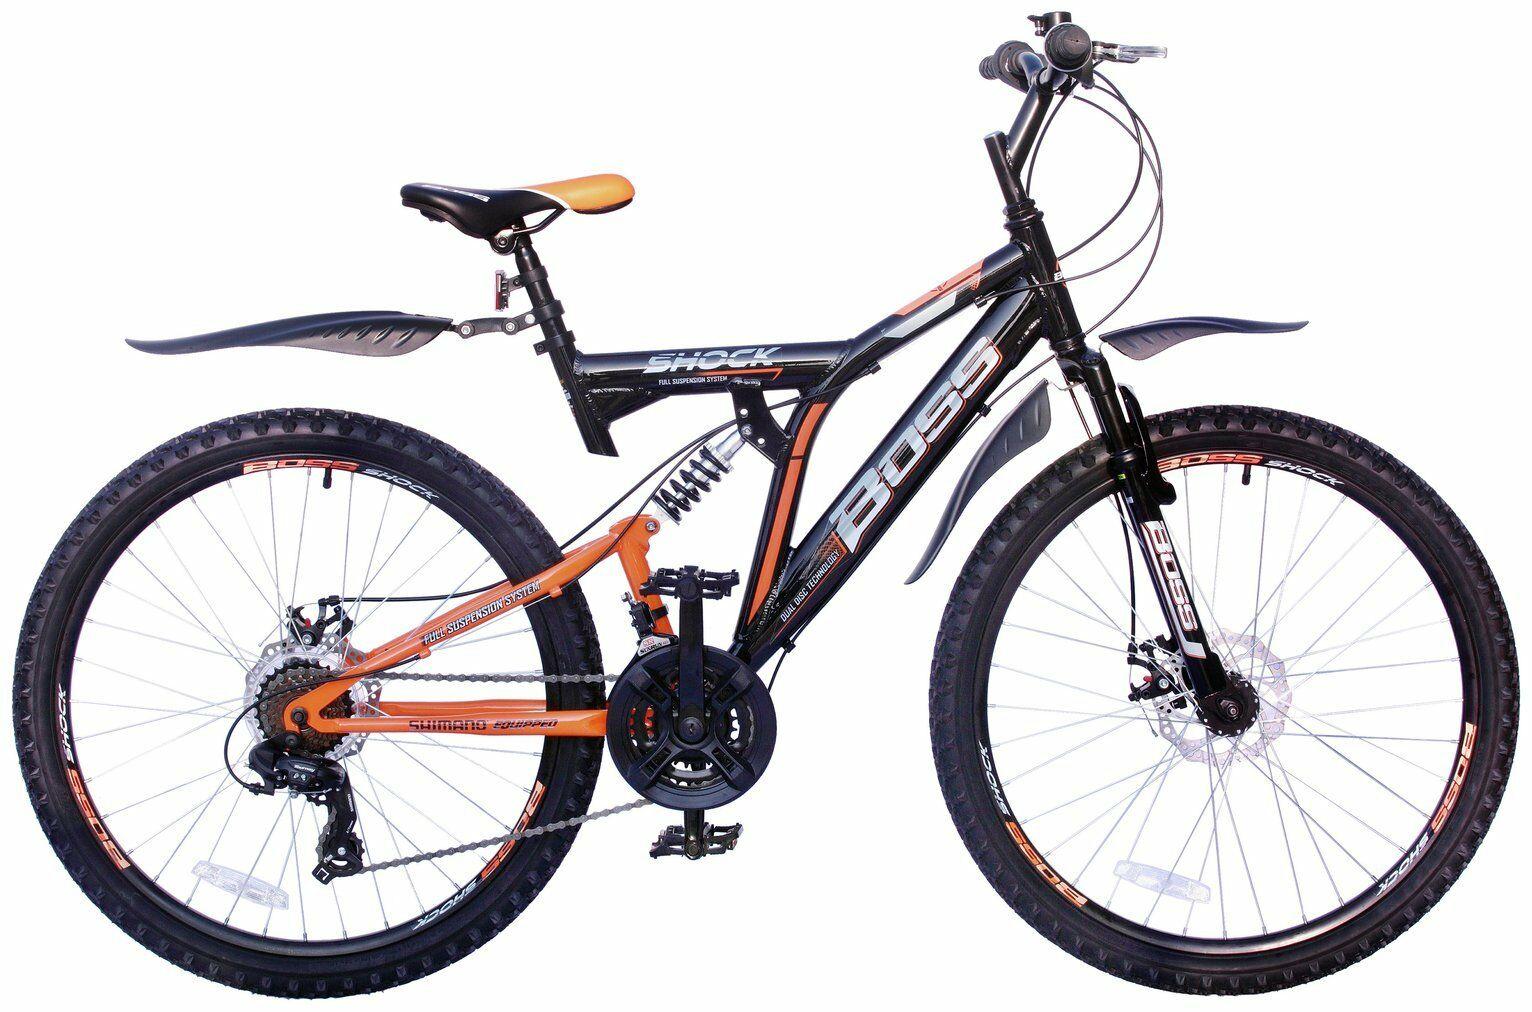 Boss Shock 26 Inch Dual Suspension Men's Mountain Bike - Orange & Black/ Boss Earthquake 26 Inch £142.49/ at Argos/ebay with code